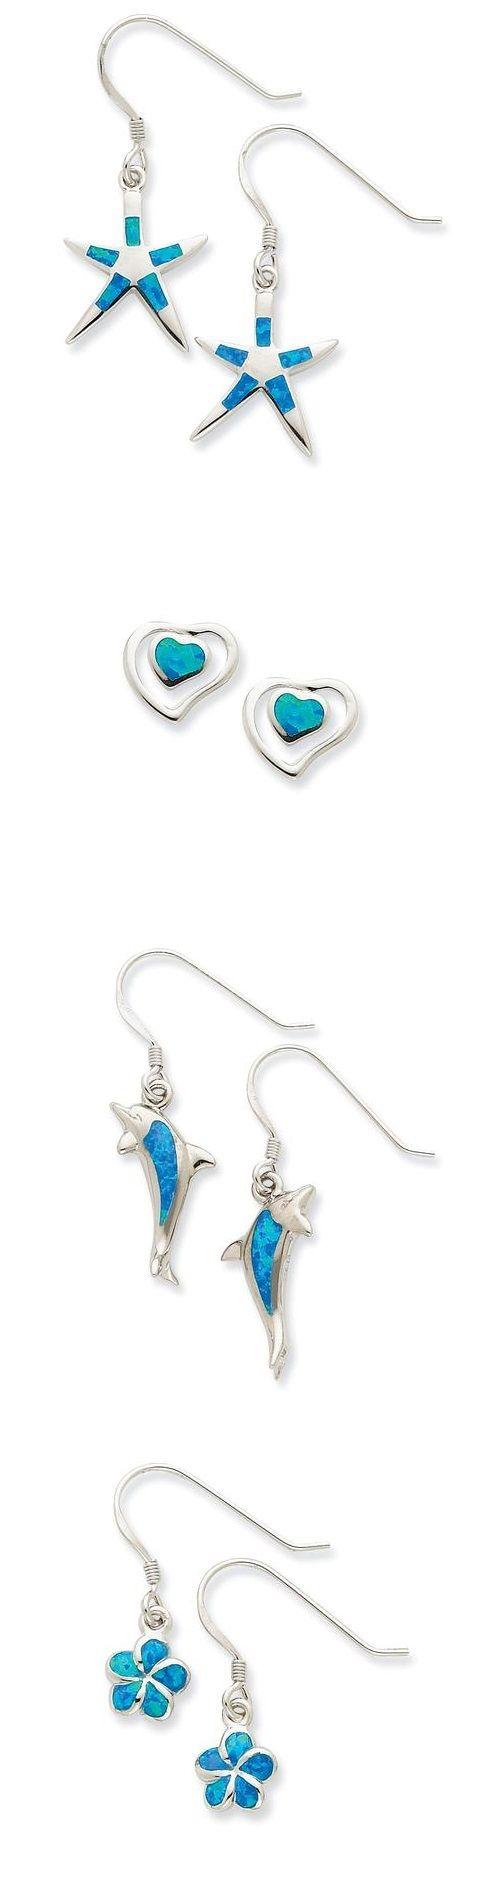 Gemstone Earrings Collection - Fashion Earrings - Trendy Jewelry